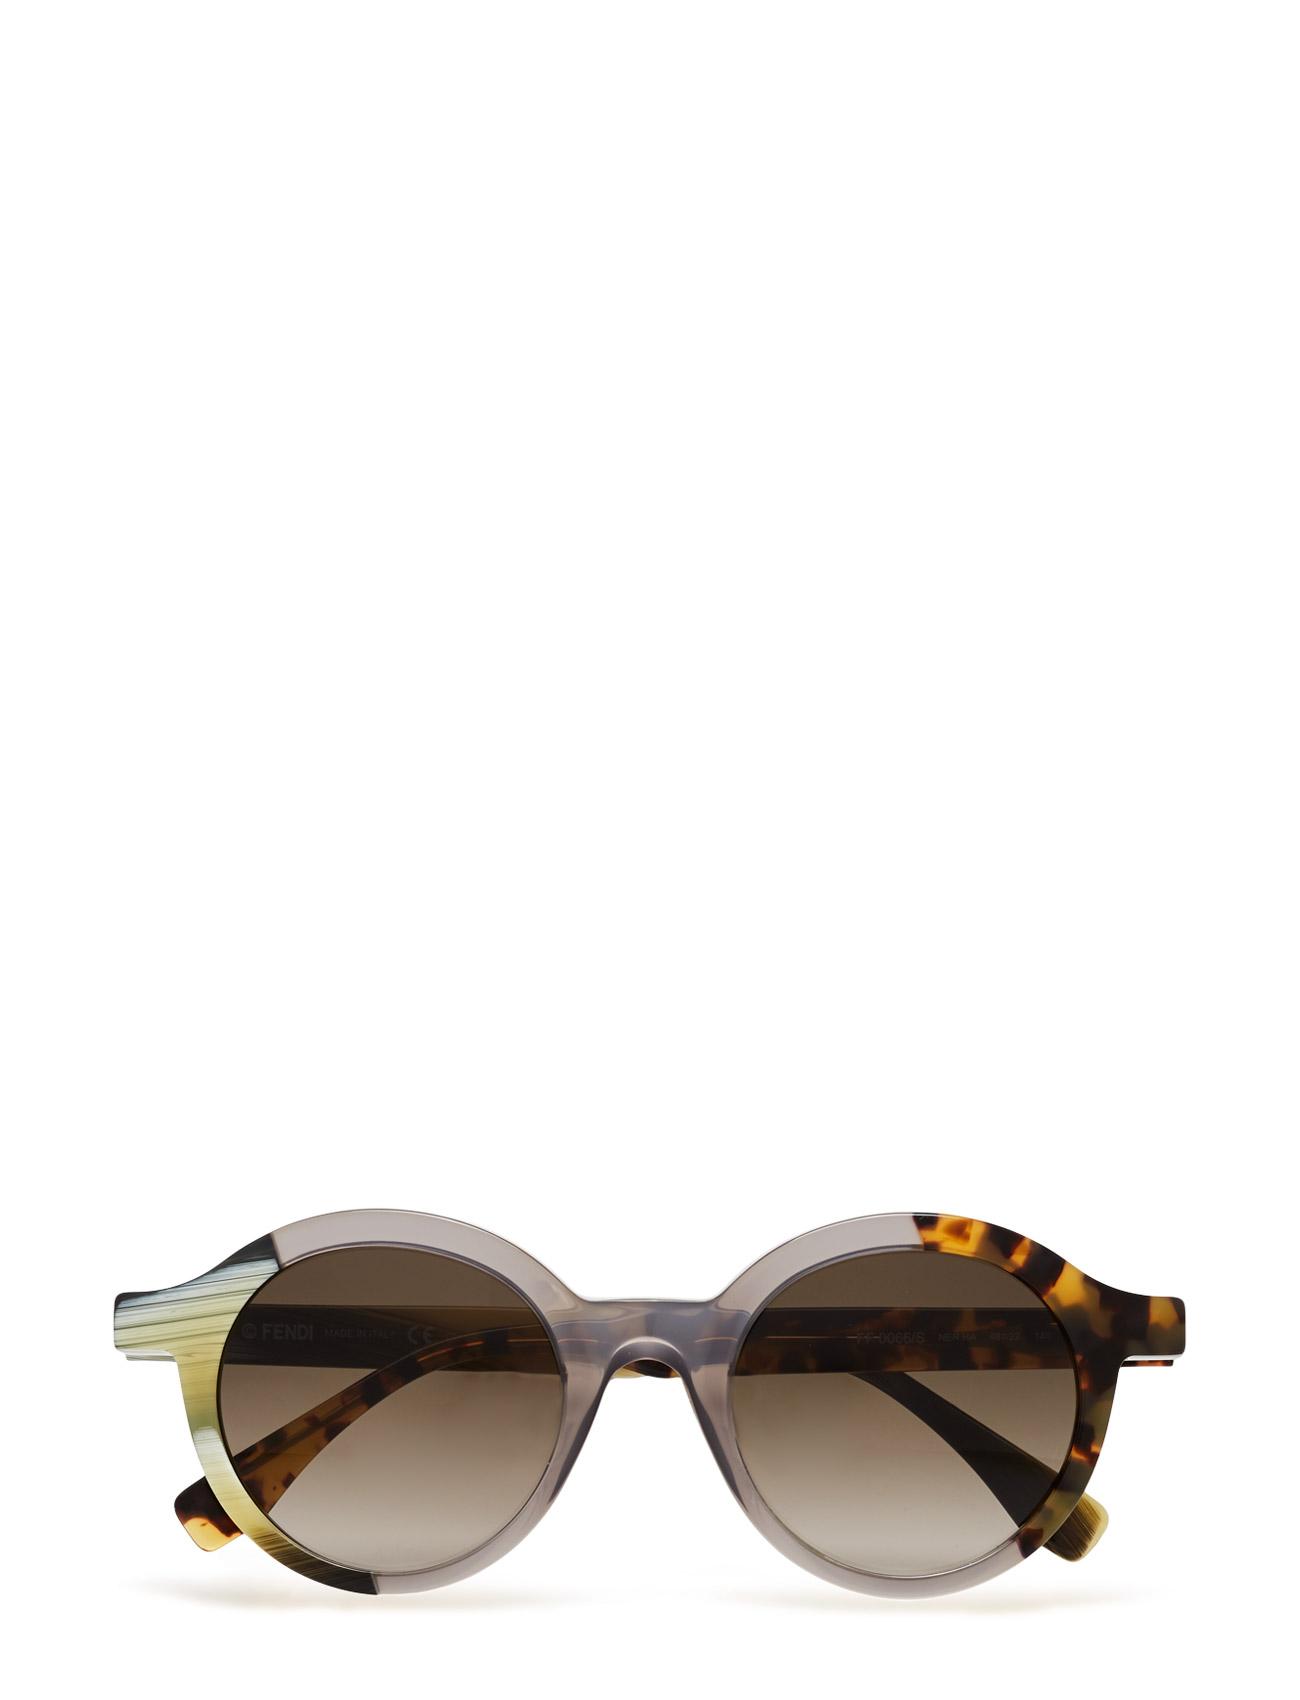 fendi sunglasses – 247539 på boozt.com dk